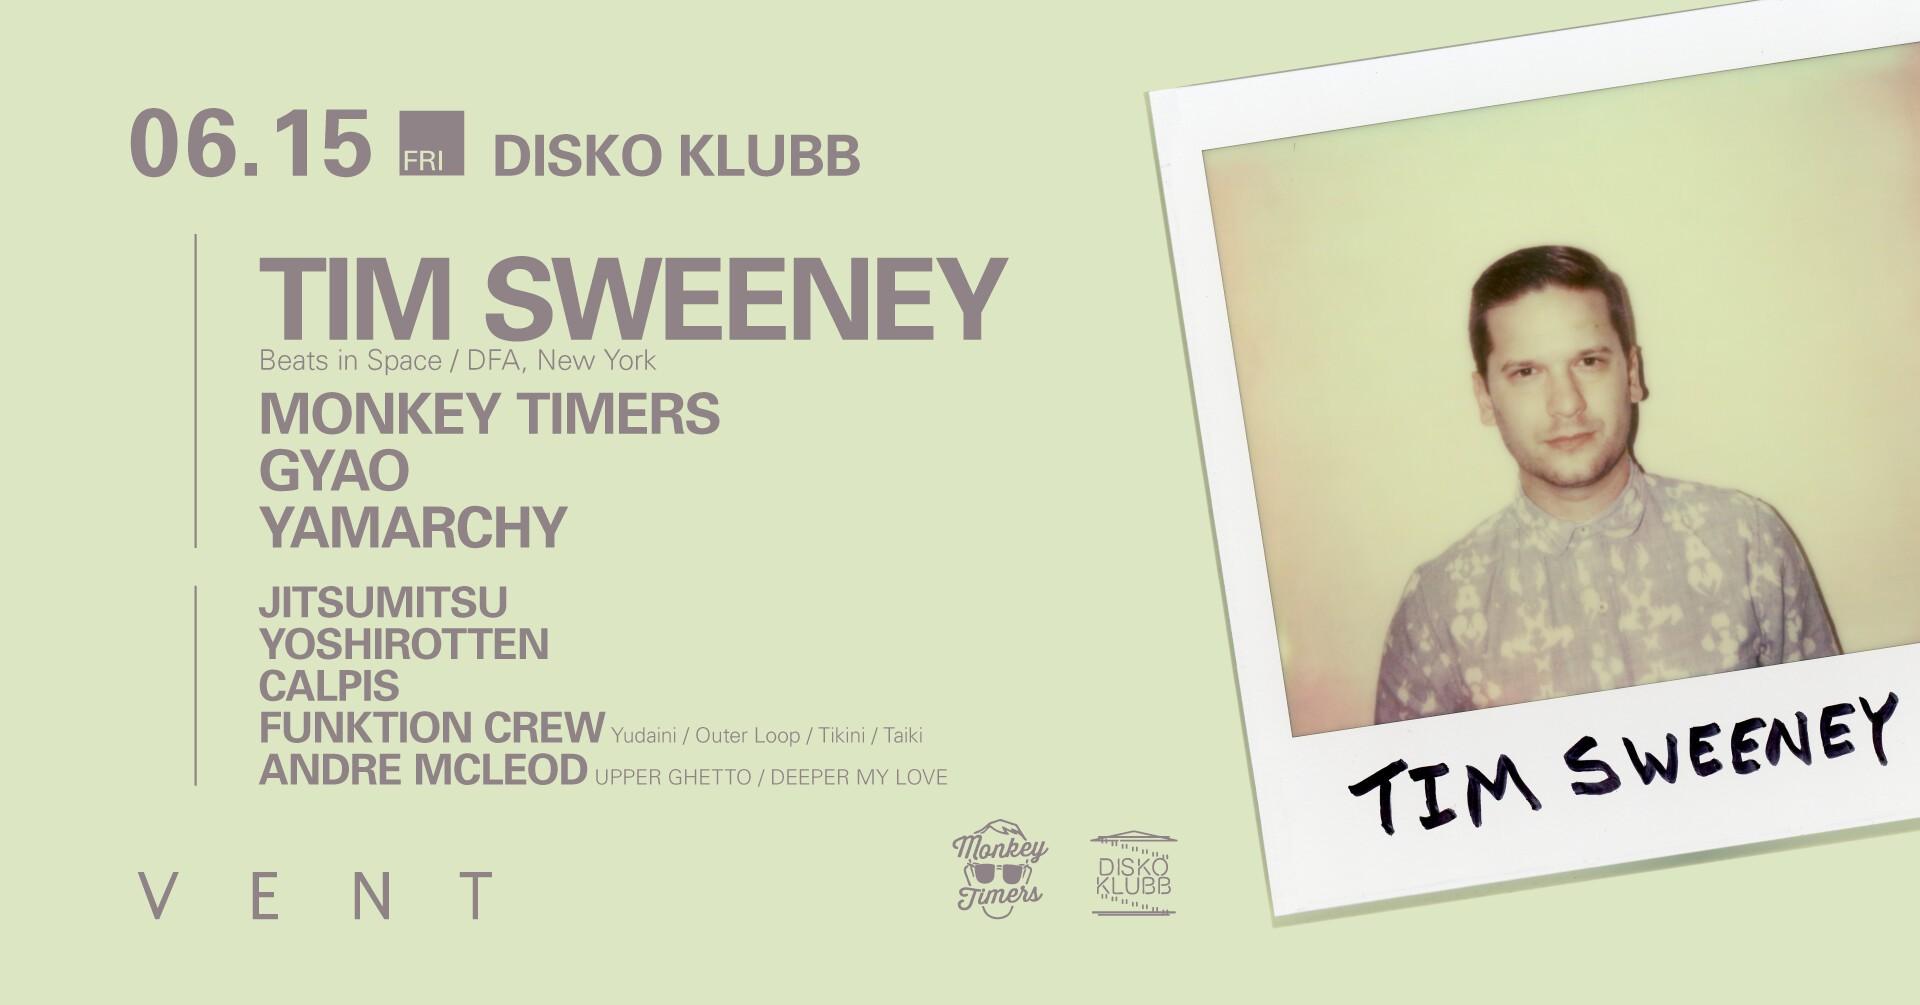 iFLYER: Tim Sweeney at DISKO KLUBB at VENT, Tokyo